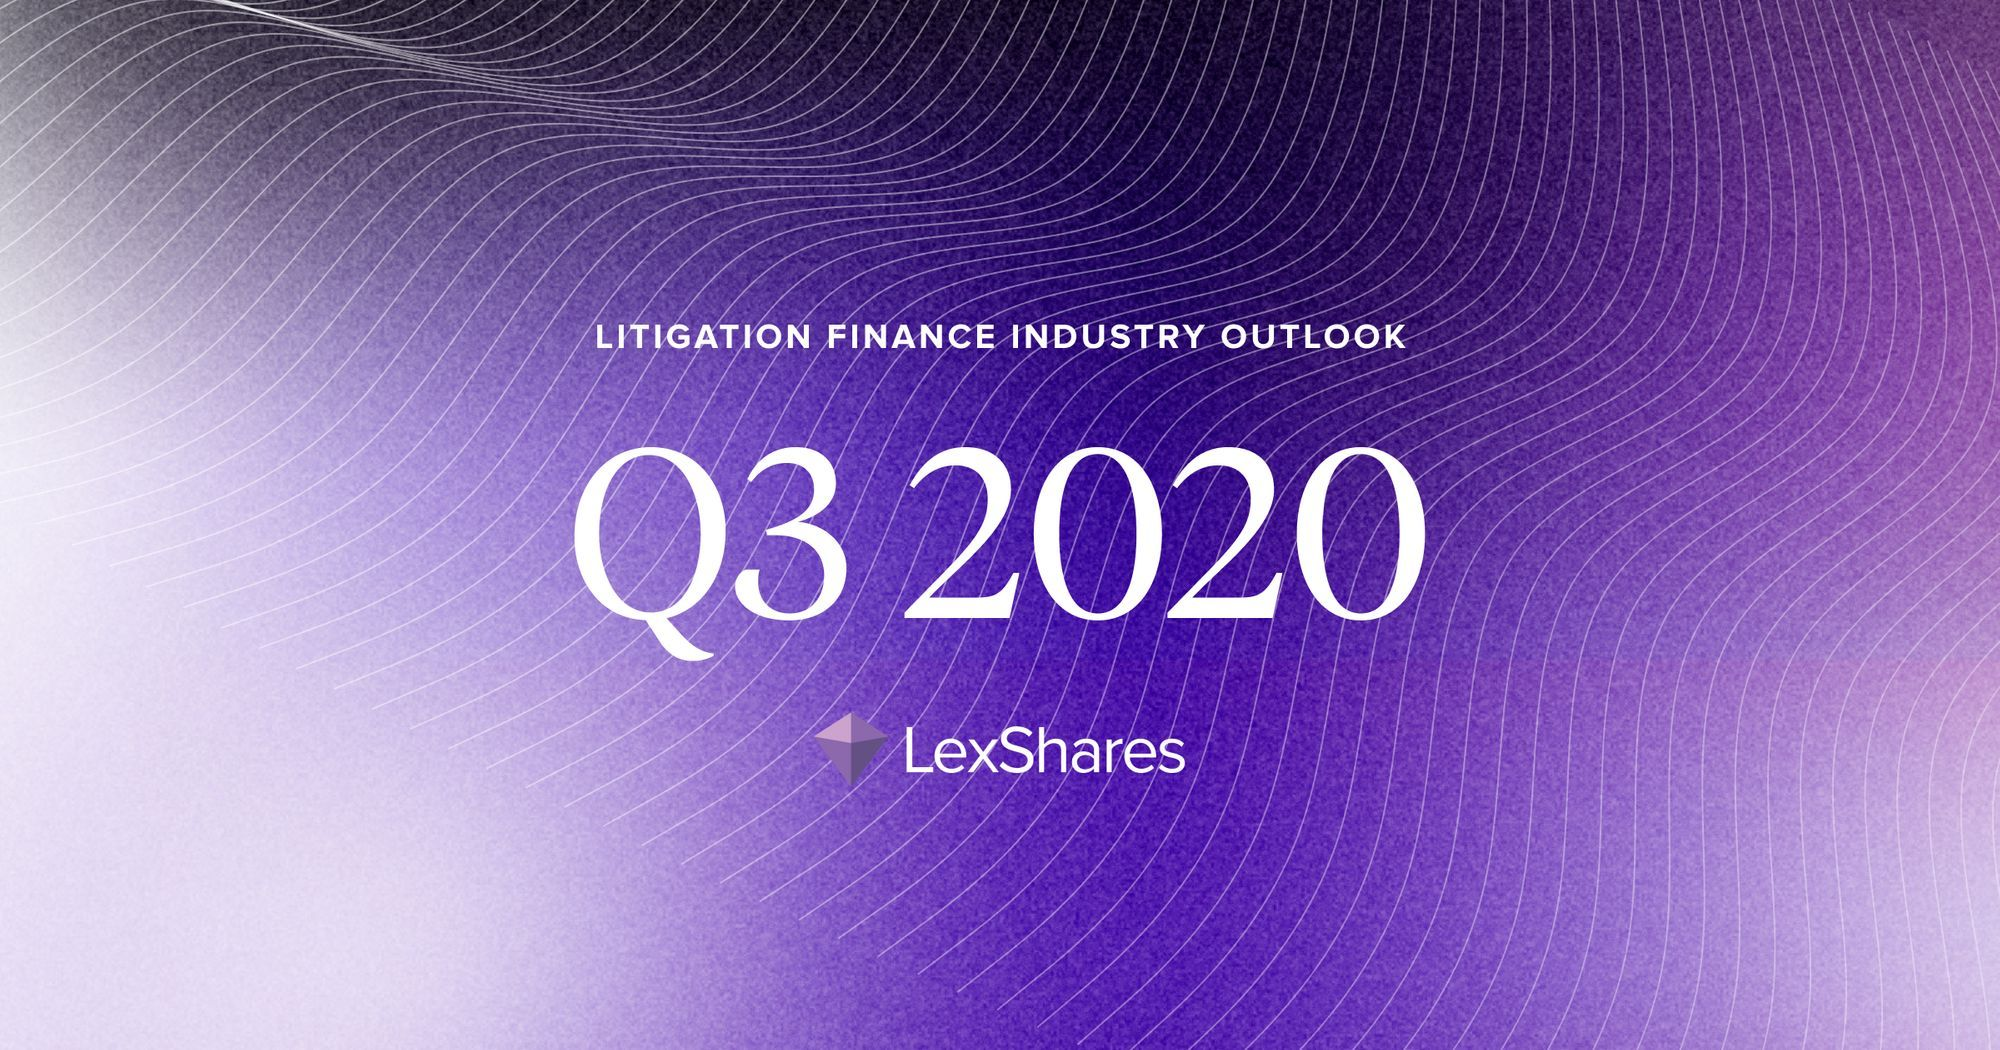 Litigation Finance Industry Outlook: Q3 2020